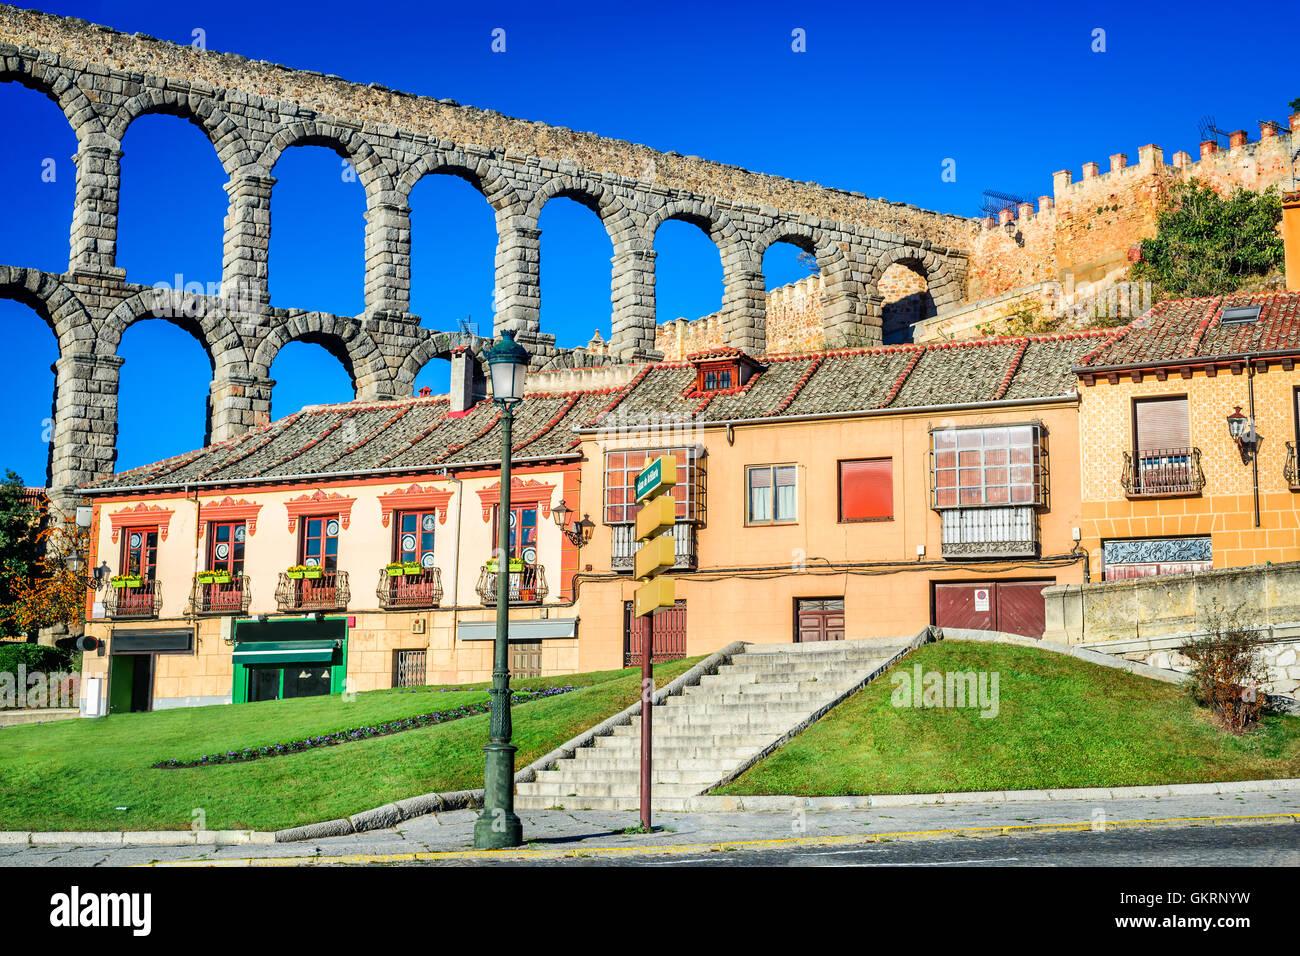 Segovia, Spain. Town view at Plaza del Artilleria and the ancient Roman aqueduct, Castilla y Leon - Stock Image